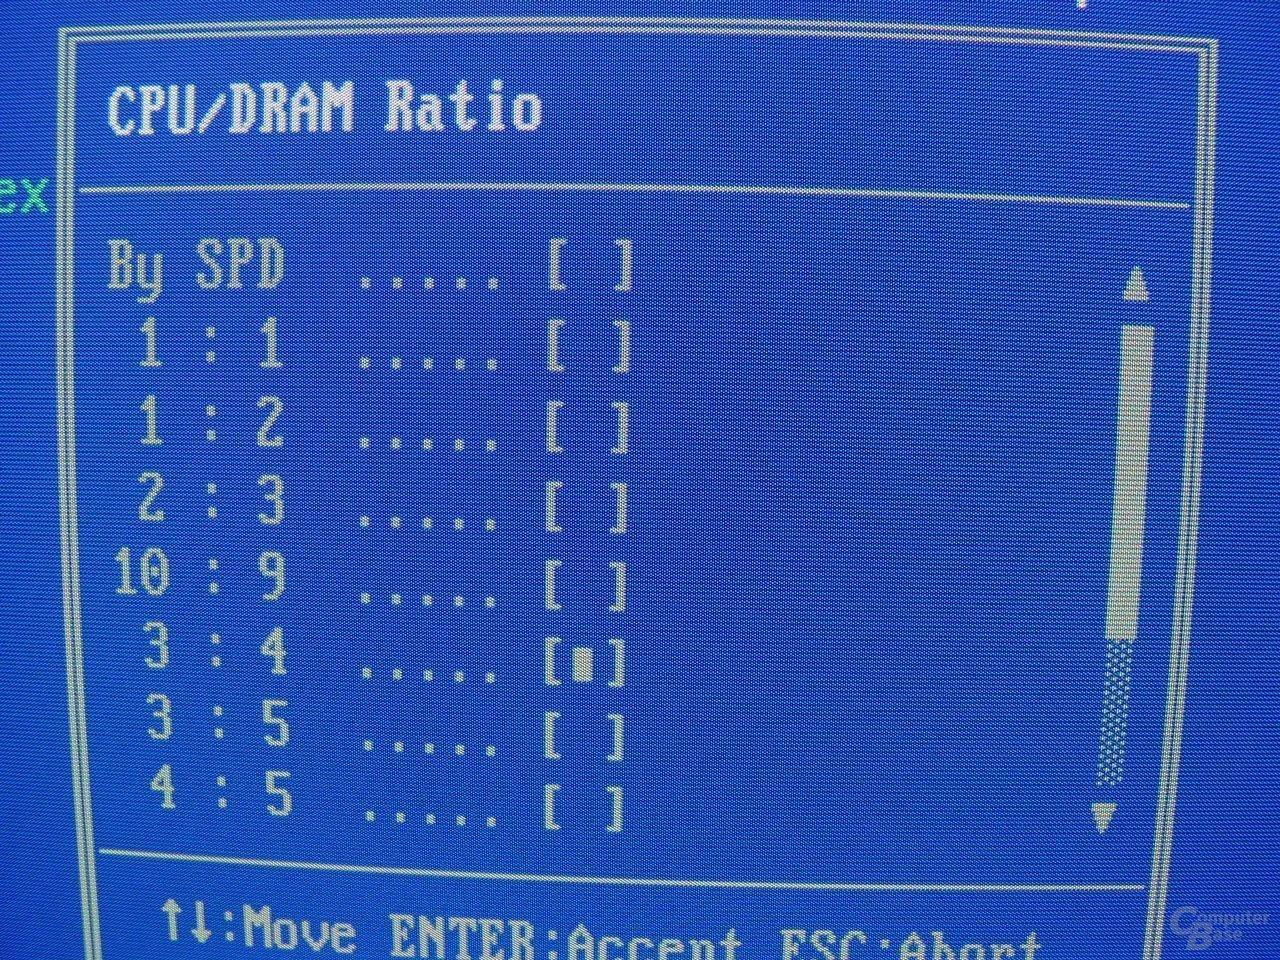 EPoX EP-4SDA5+ - Bios - RAM-Ratio